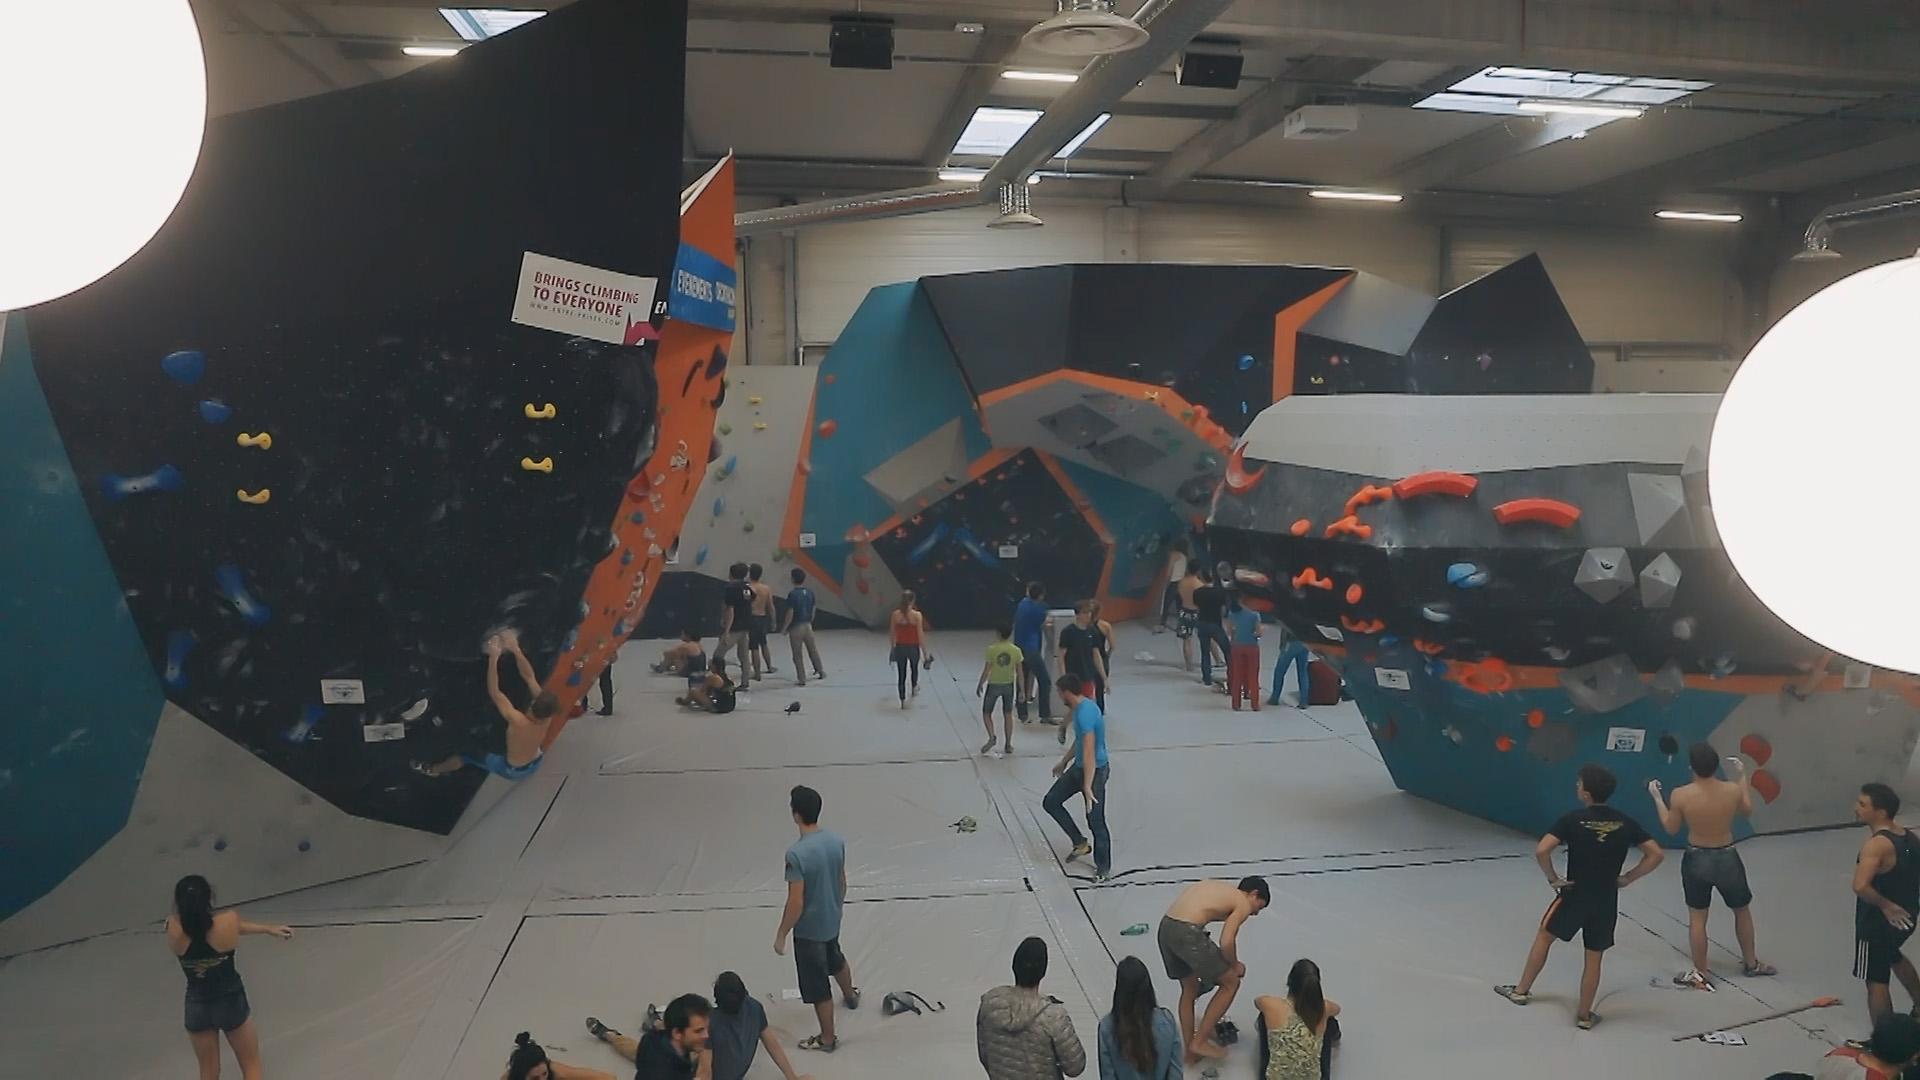 Vertical Art salle d'escalade de bloc partout en France